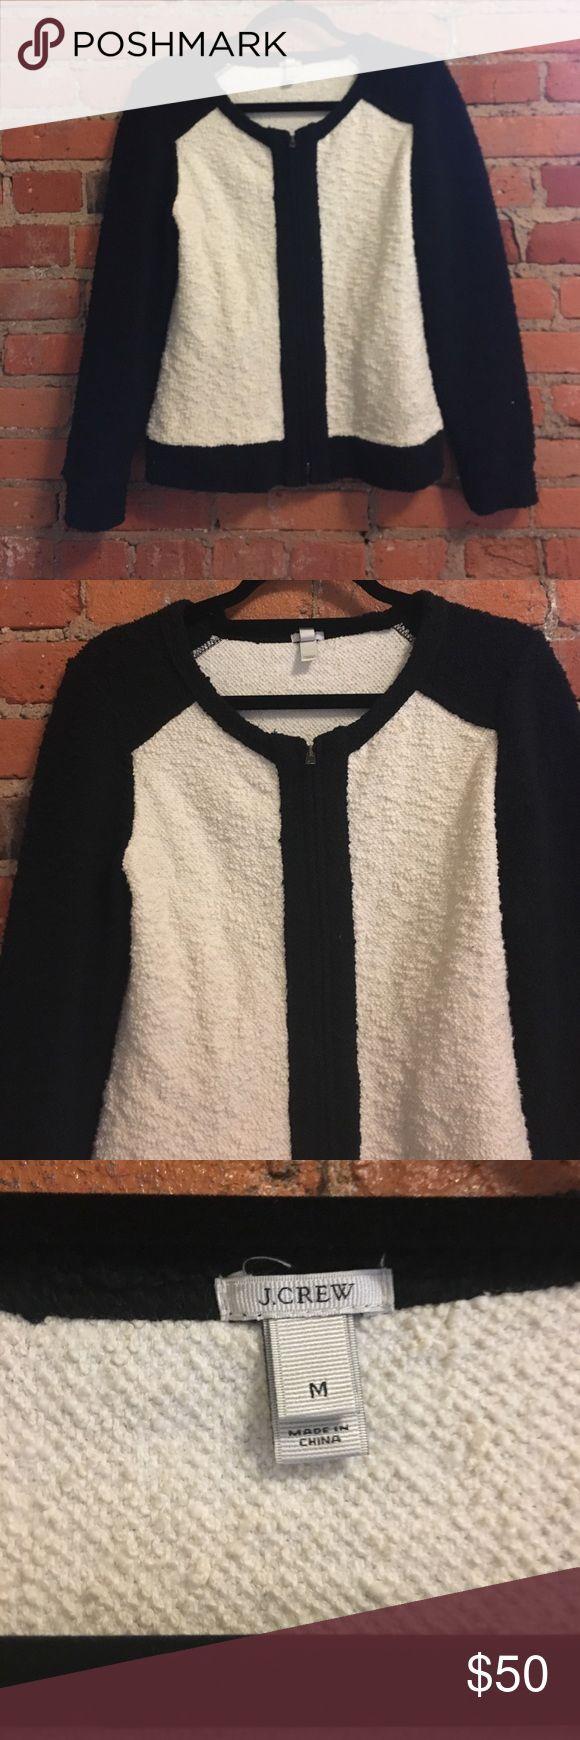 J.Crew black and cream zip up cardigan jacket M Excellent condition, maybe worn twice. Size medium. J. Crew Sweaters Cardigans